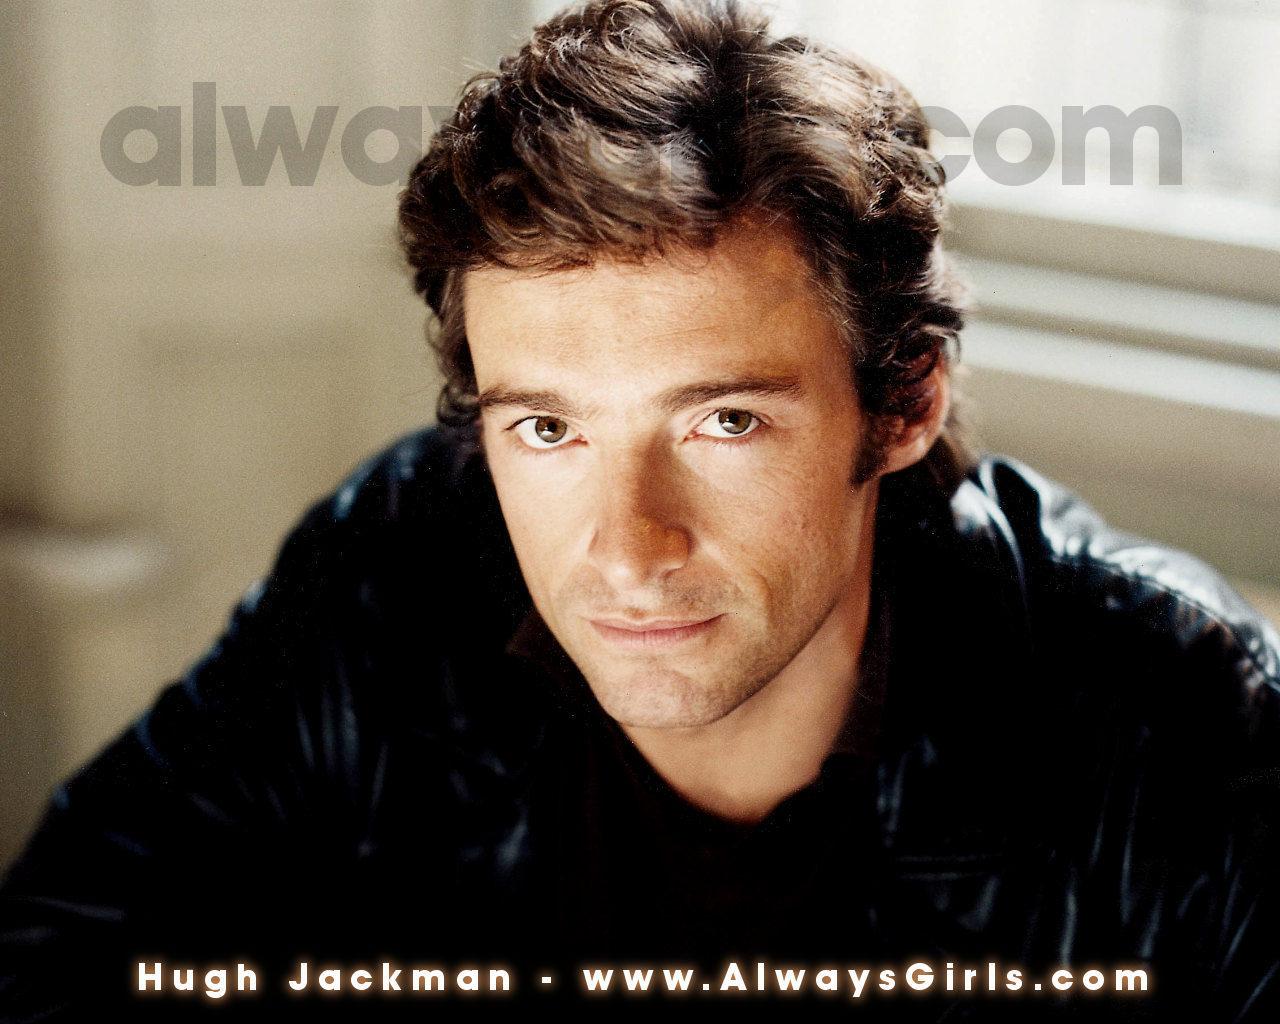 Hugh Jackman Hugh Jackman